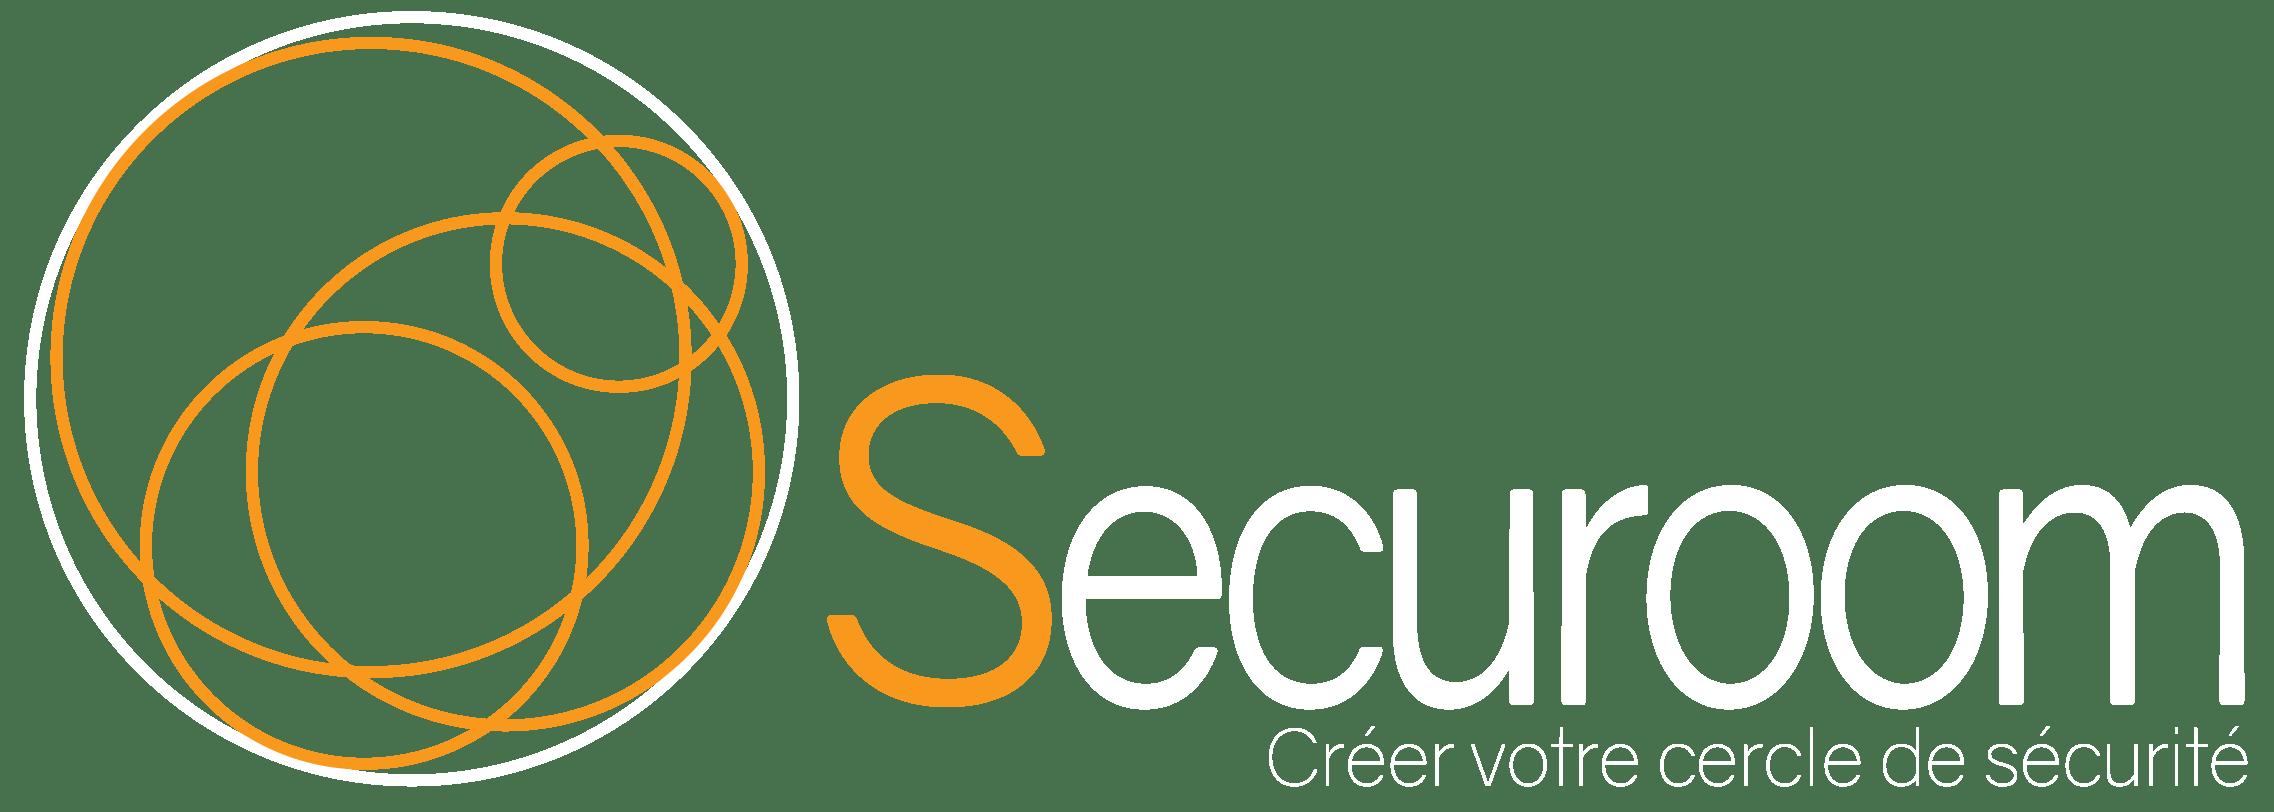 Securoom